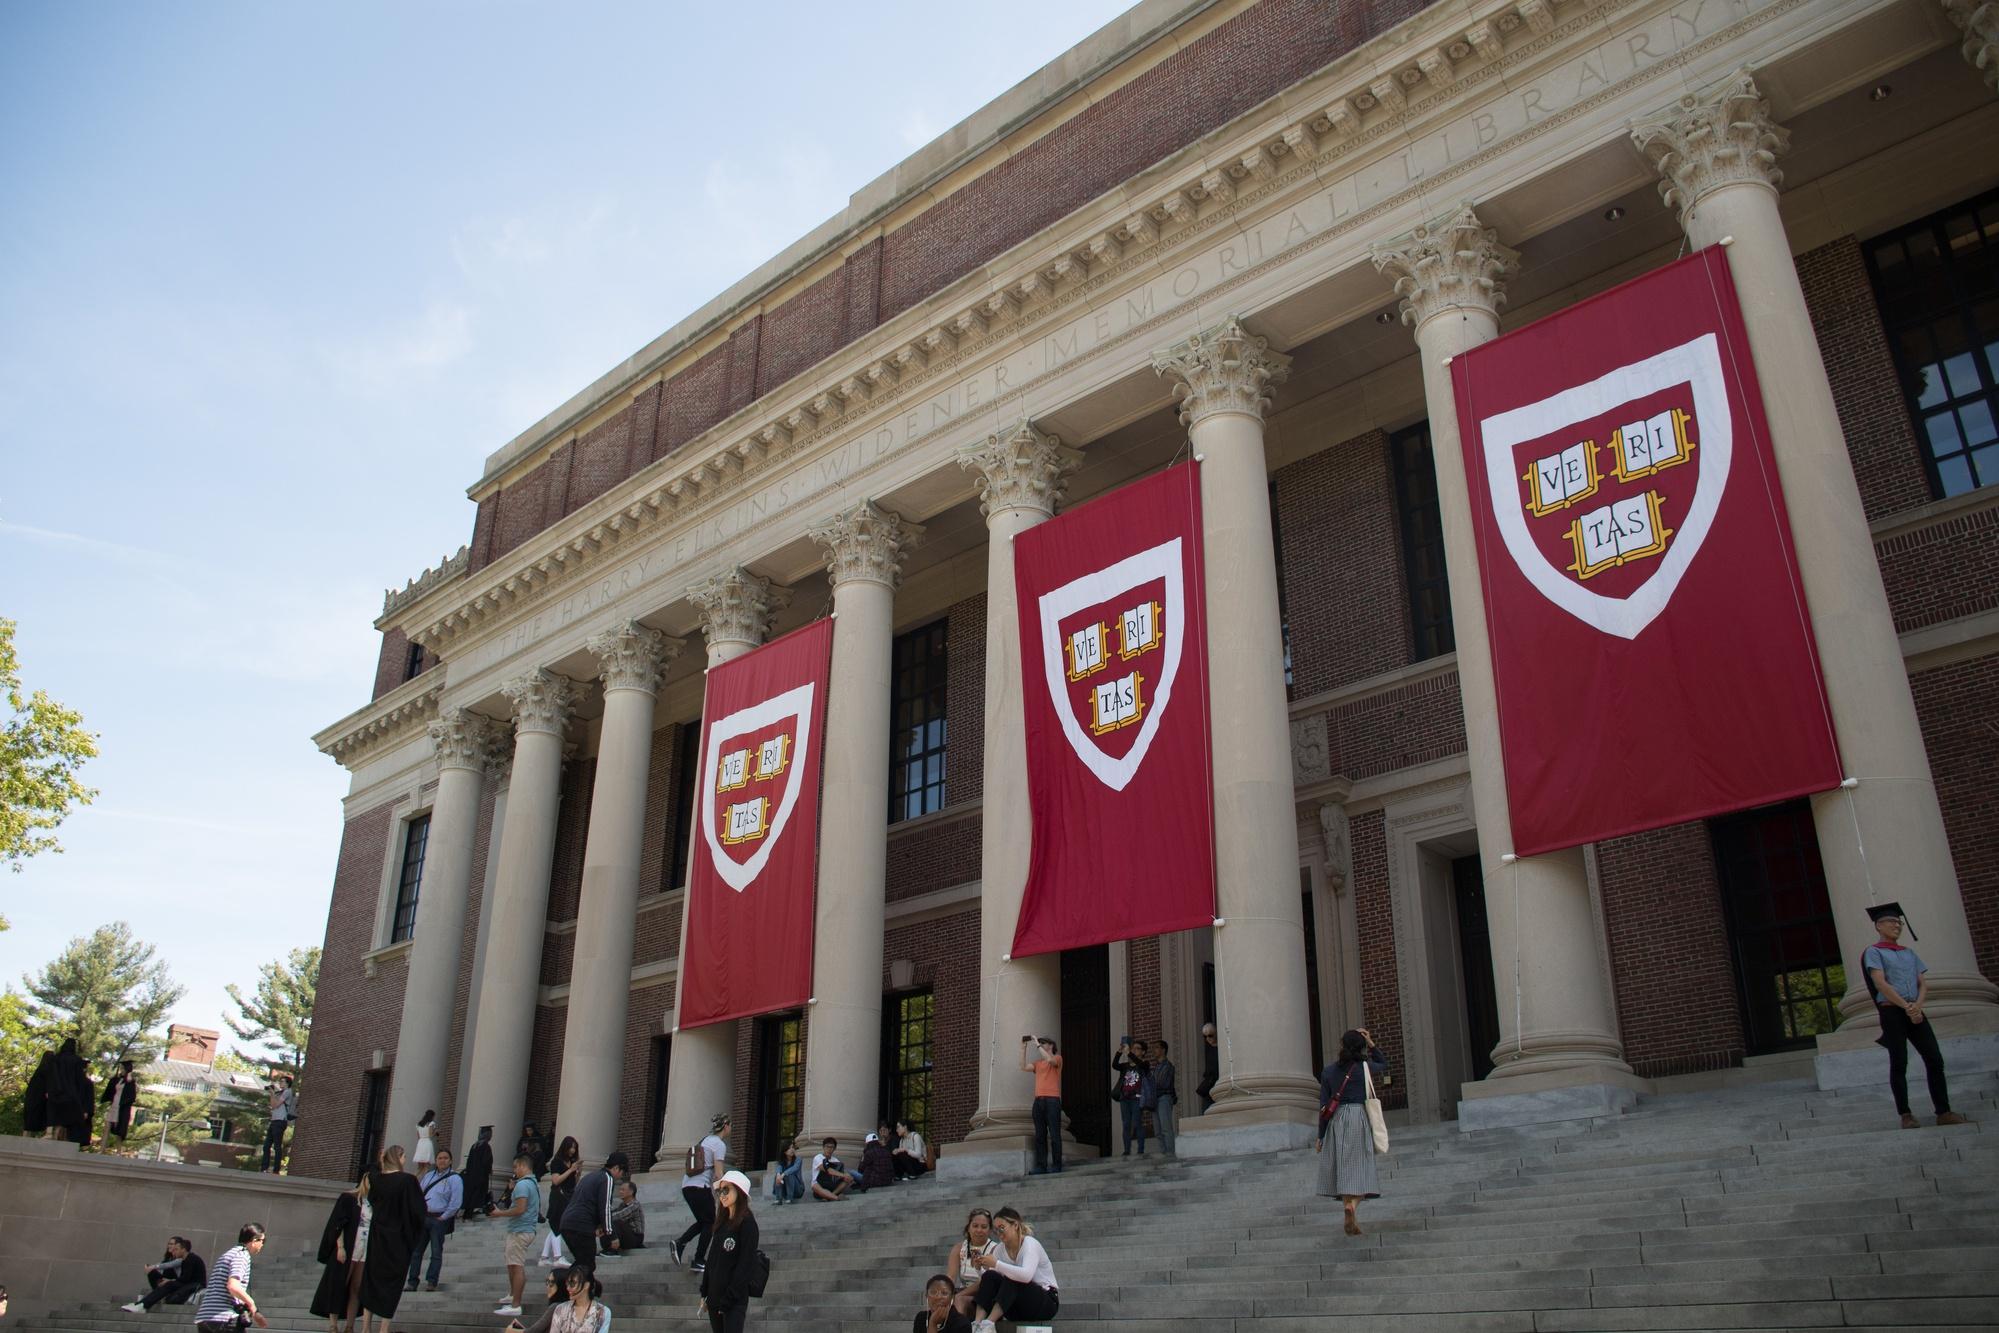 Harvard University's Widener Library.